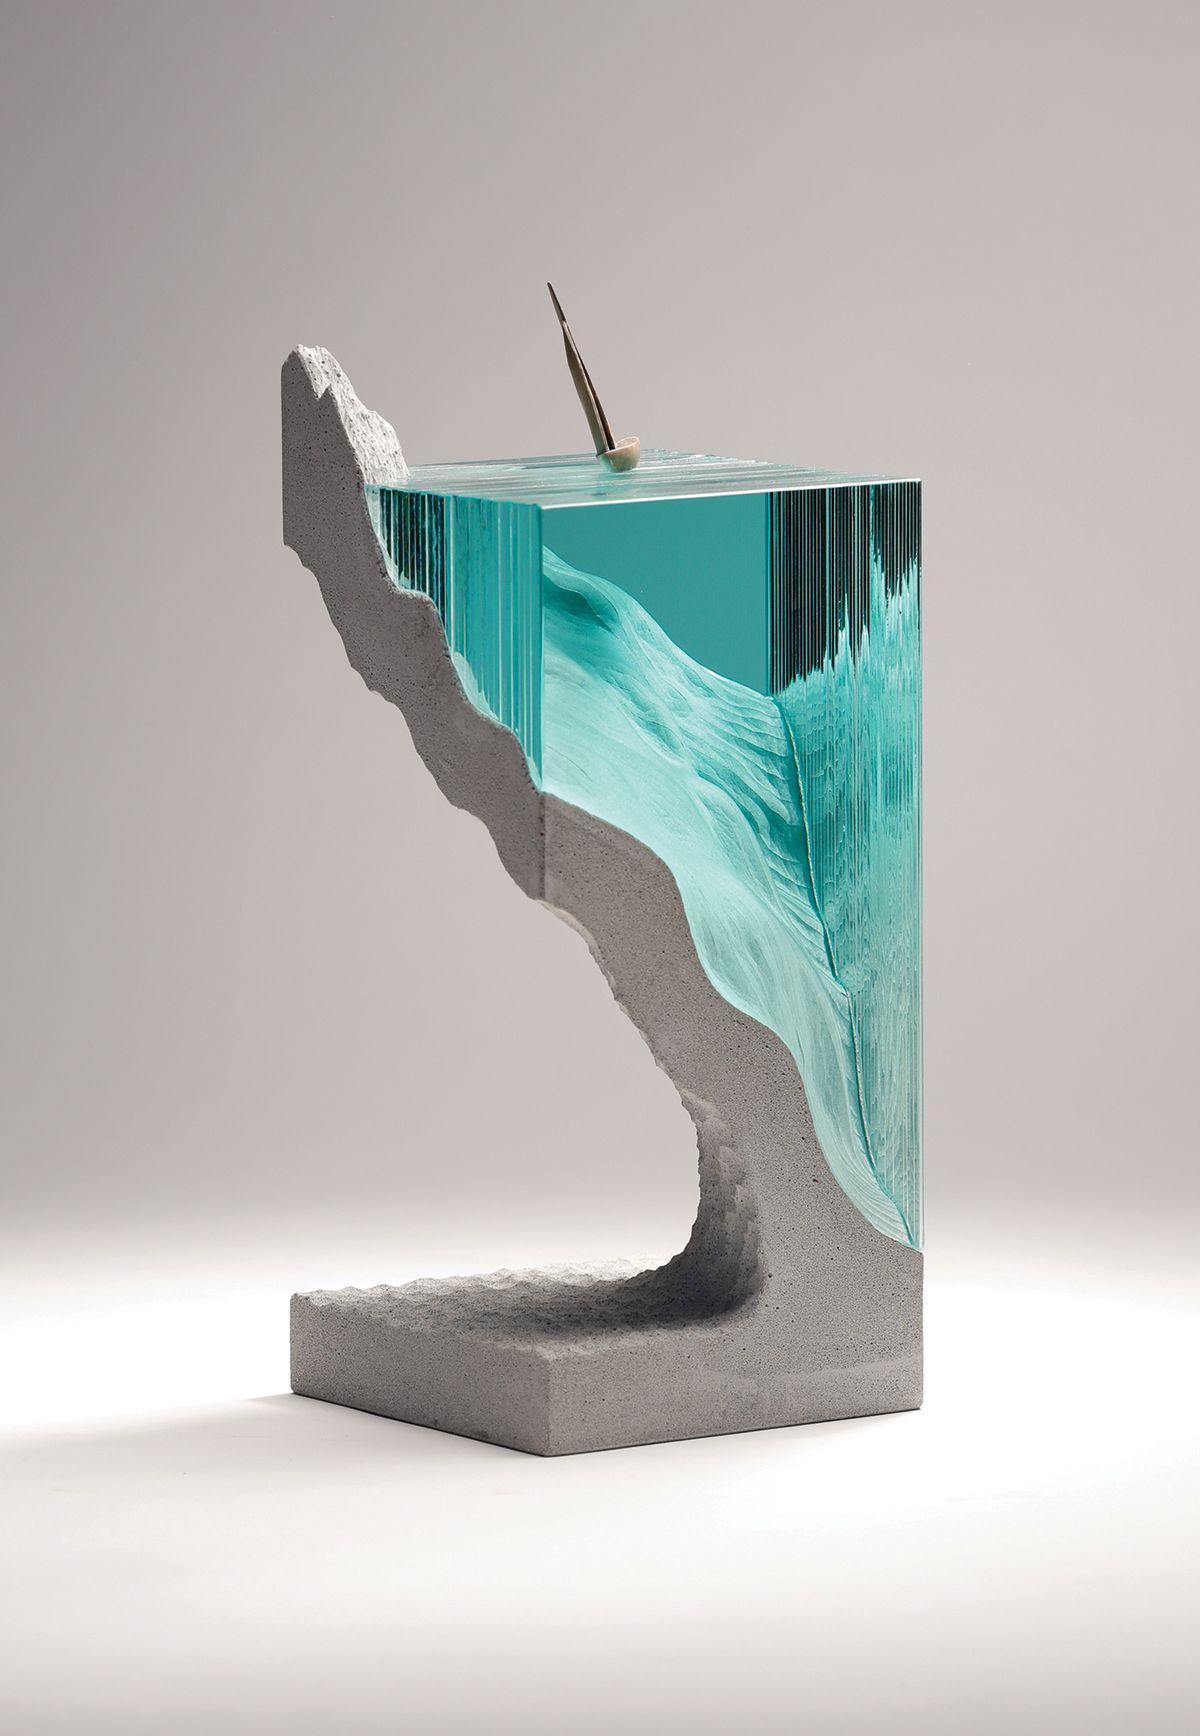 Main Project Inspiration 2020: Epoxy Resin Art – Aesthetics